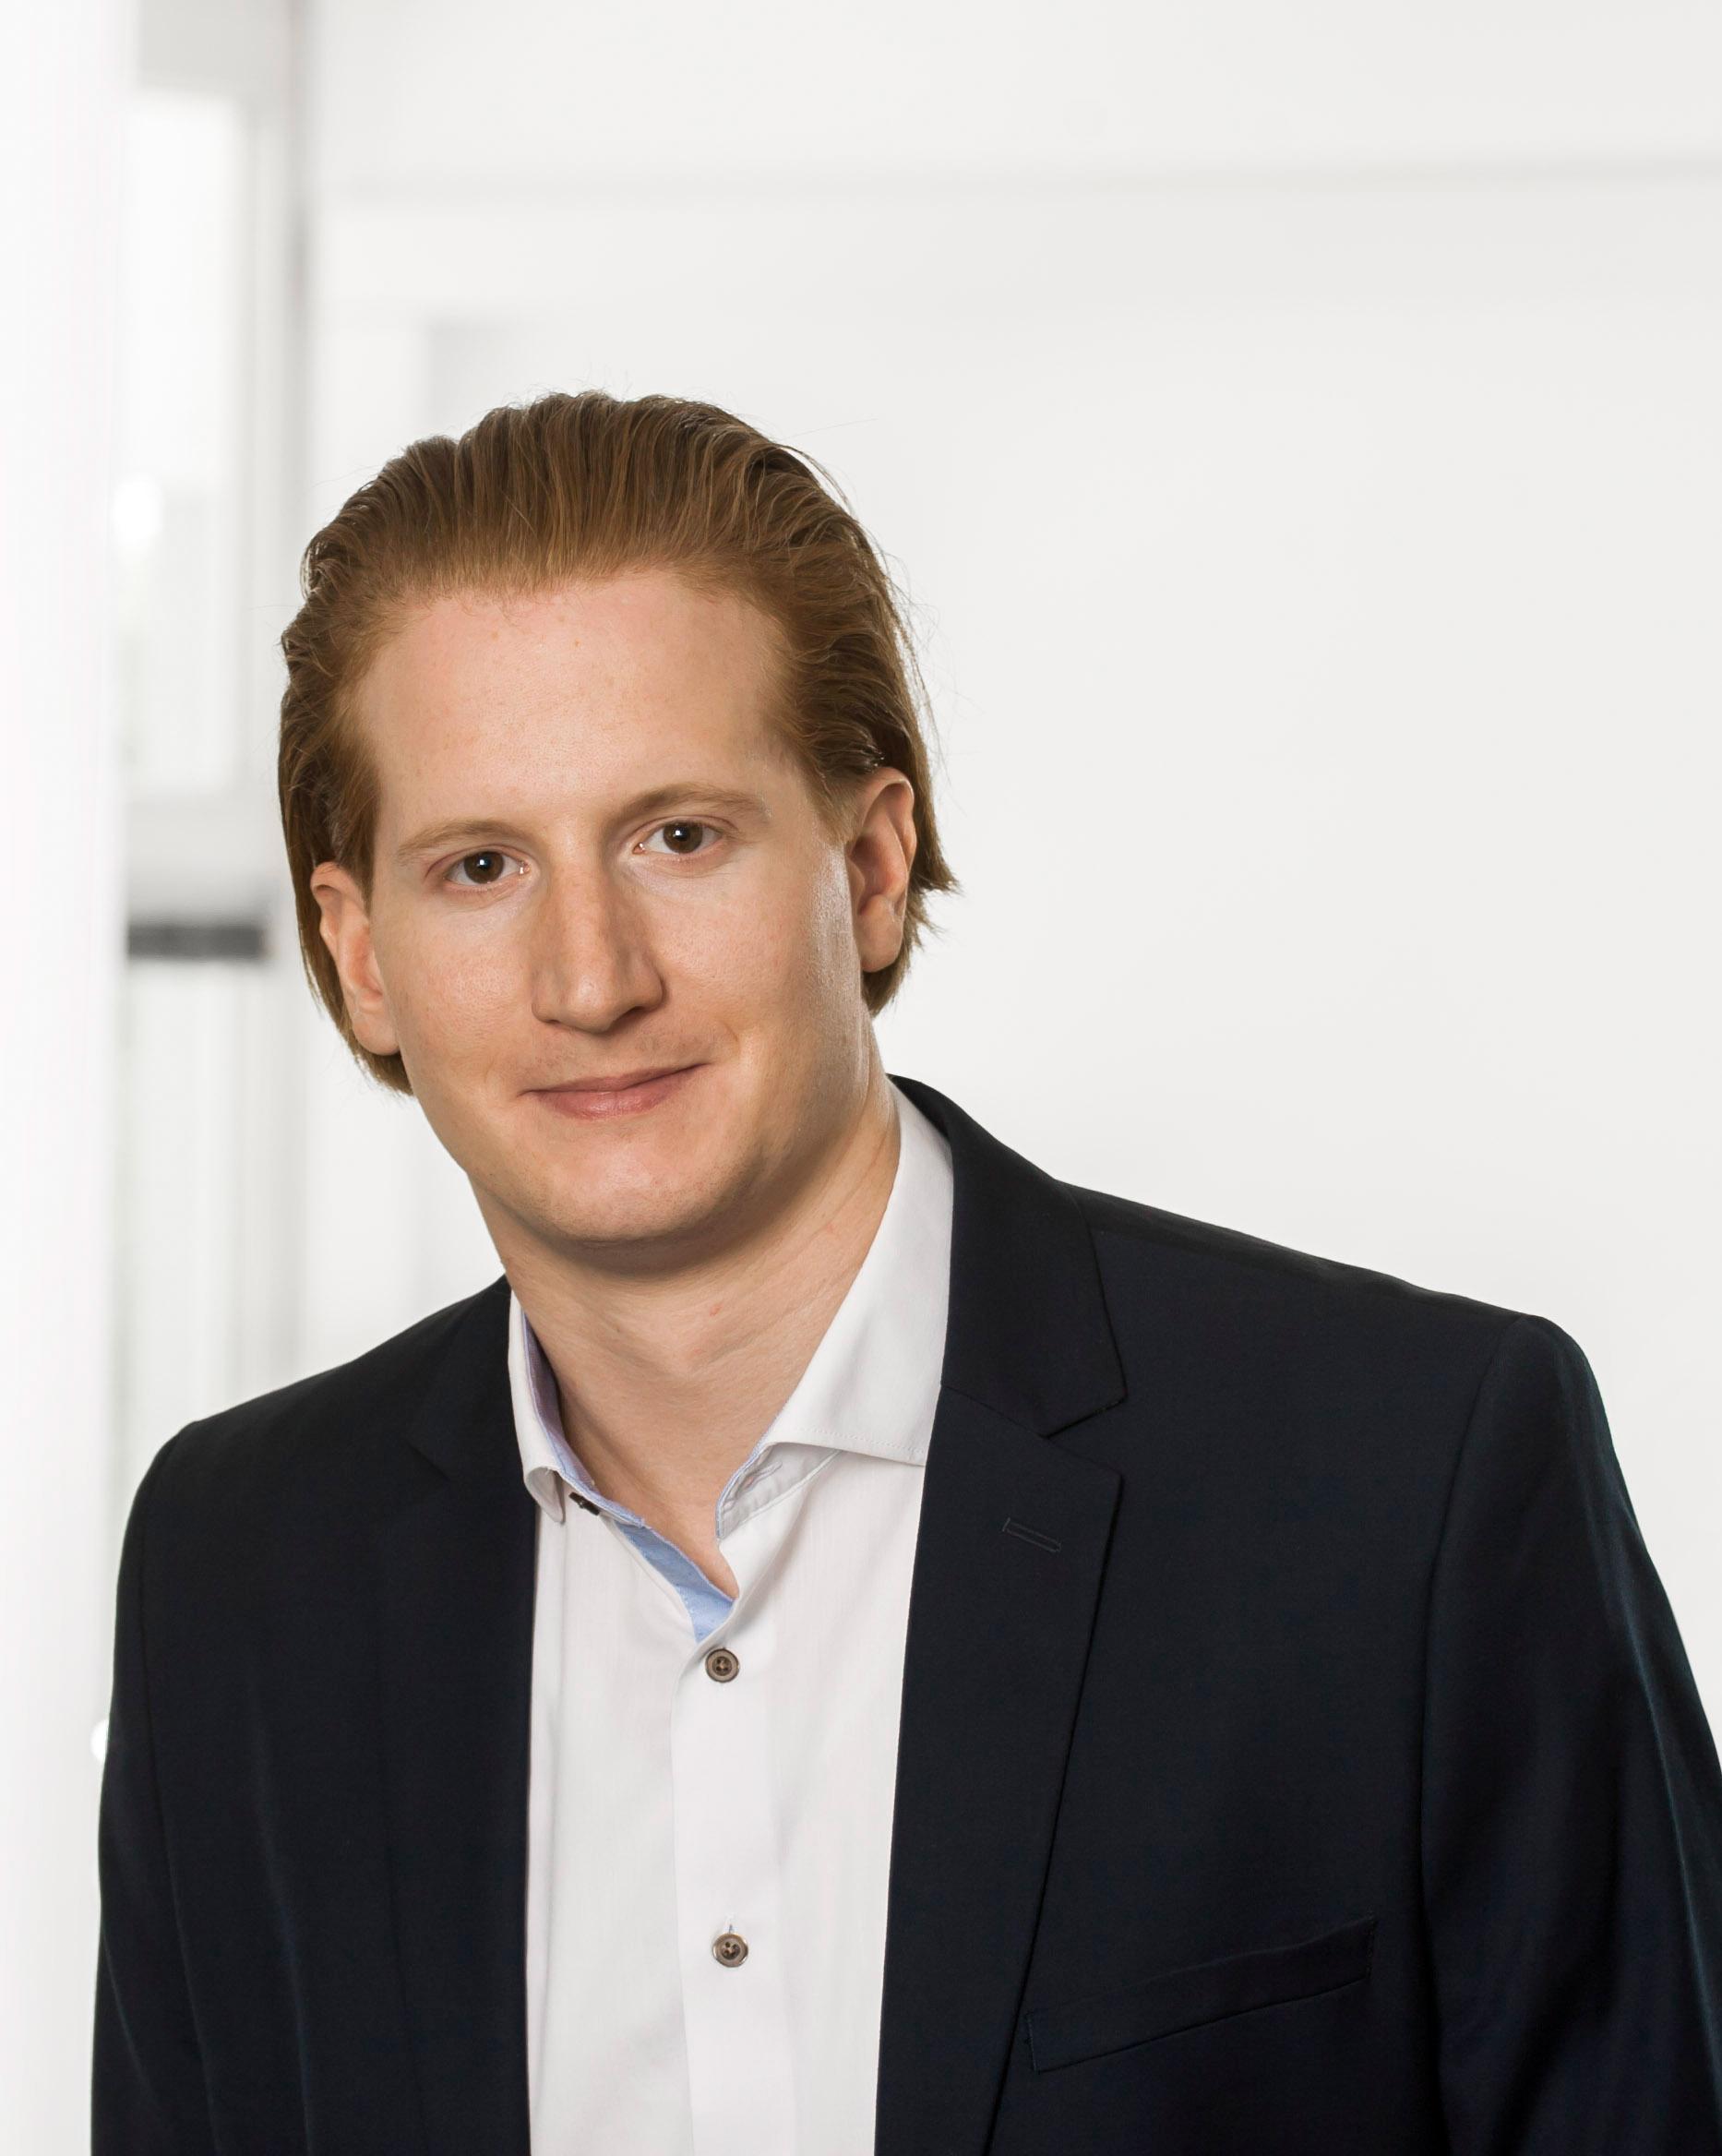 Ingmar Kleinsteuer